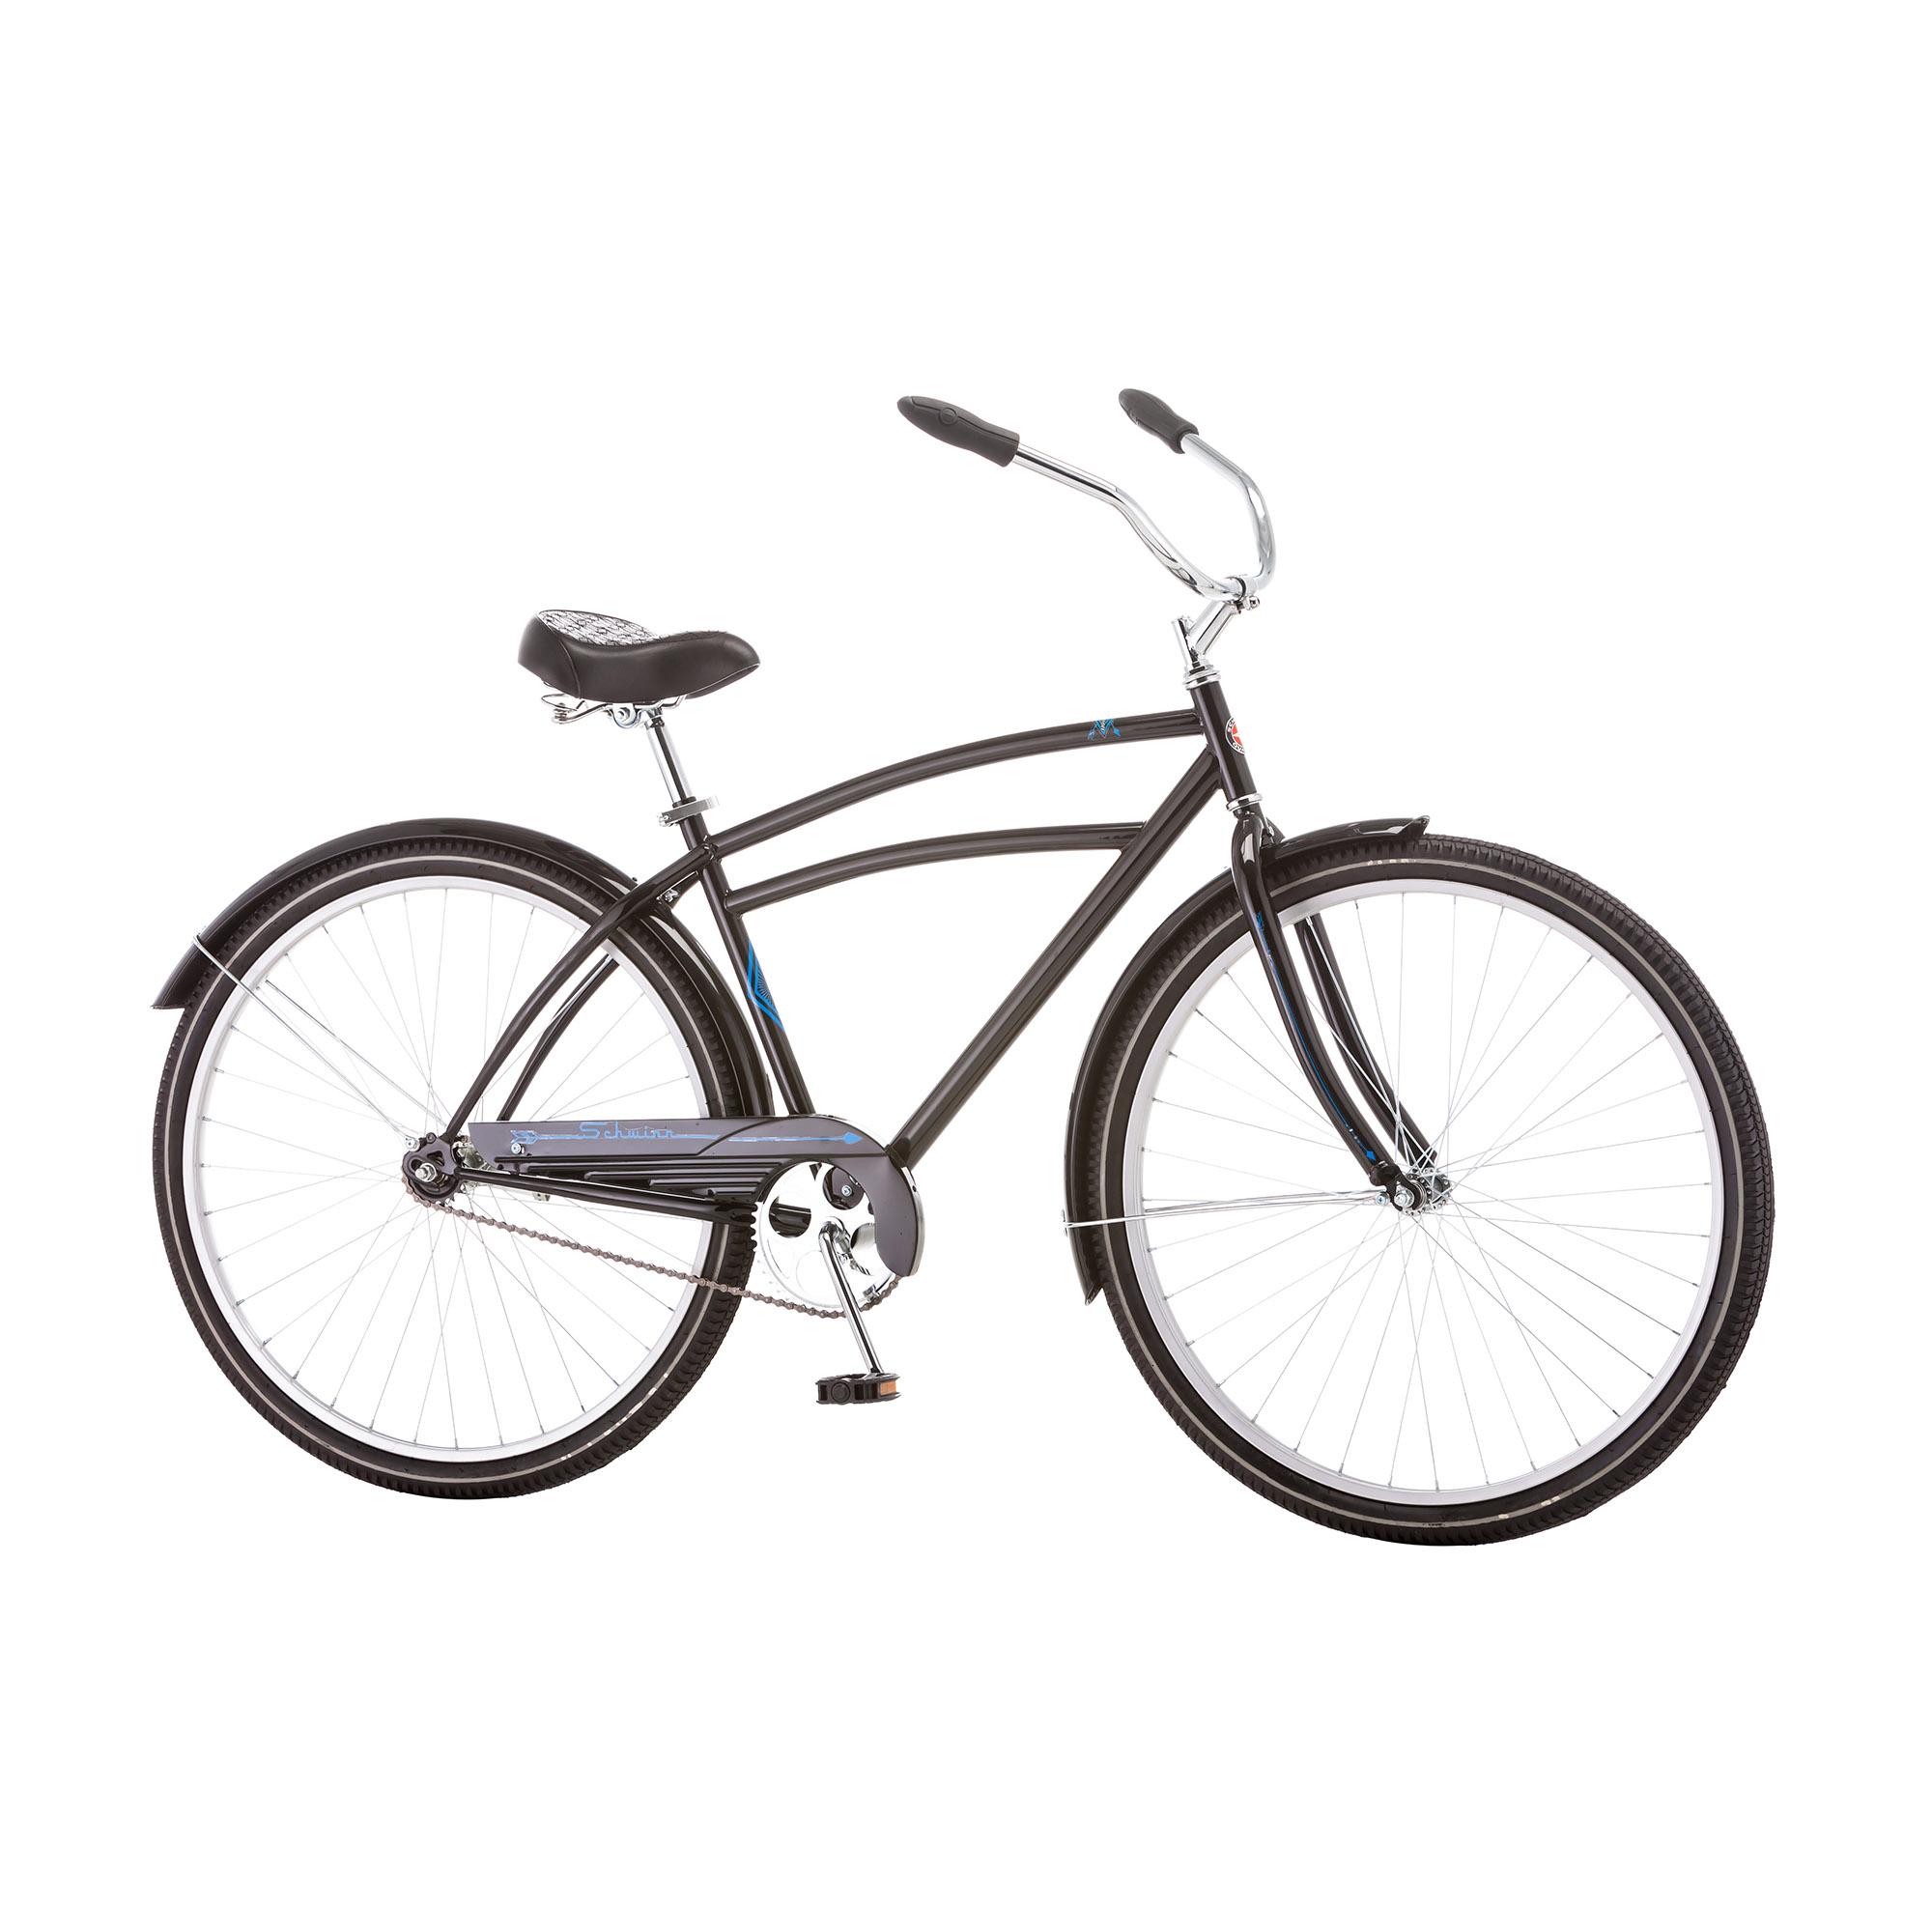 "Schwinn Gammon 29"" Men's Retro Style Single Speed Comfort Cruiser Bicycle, Black"